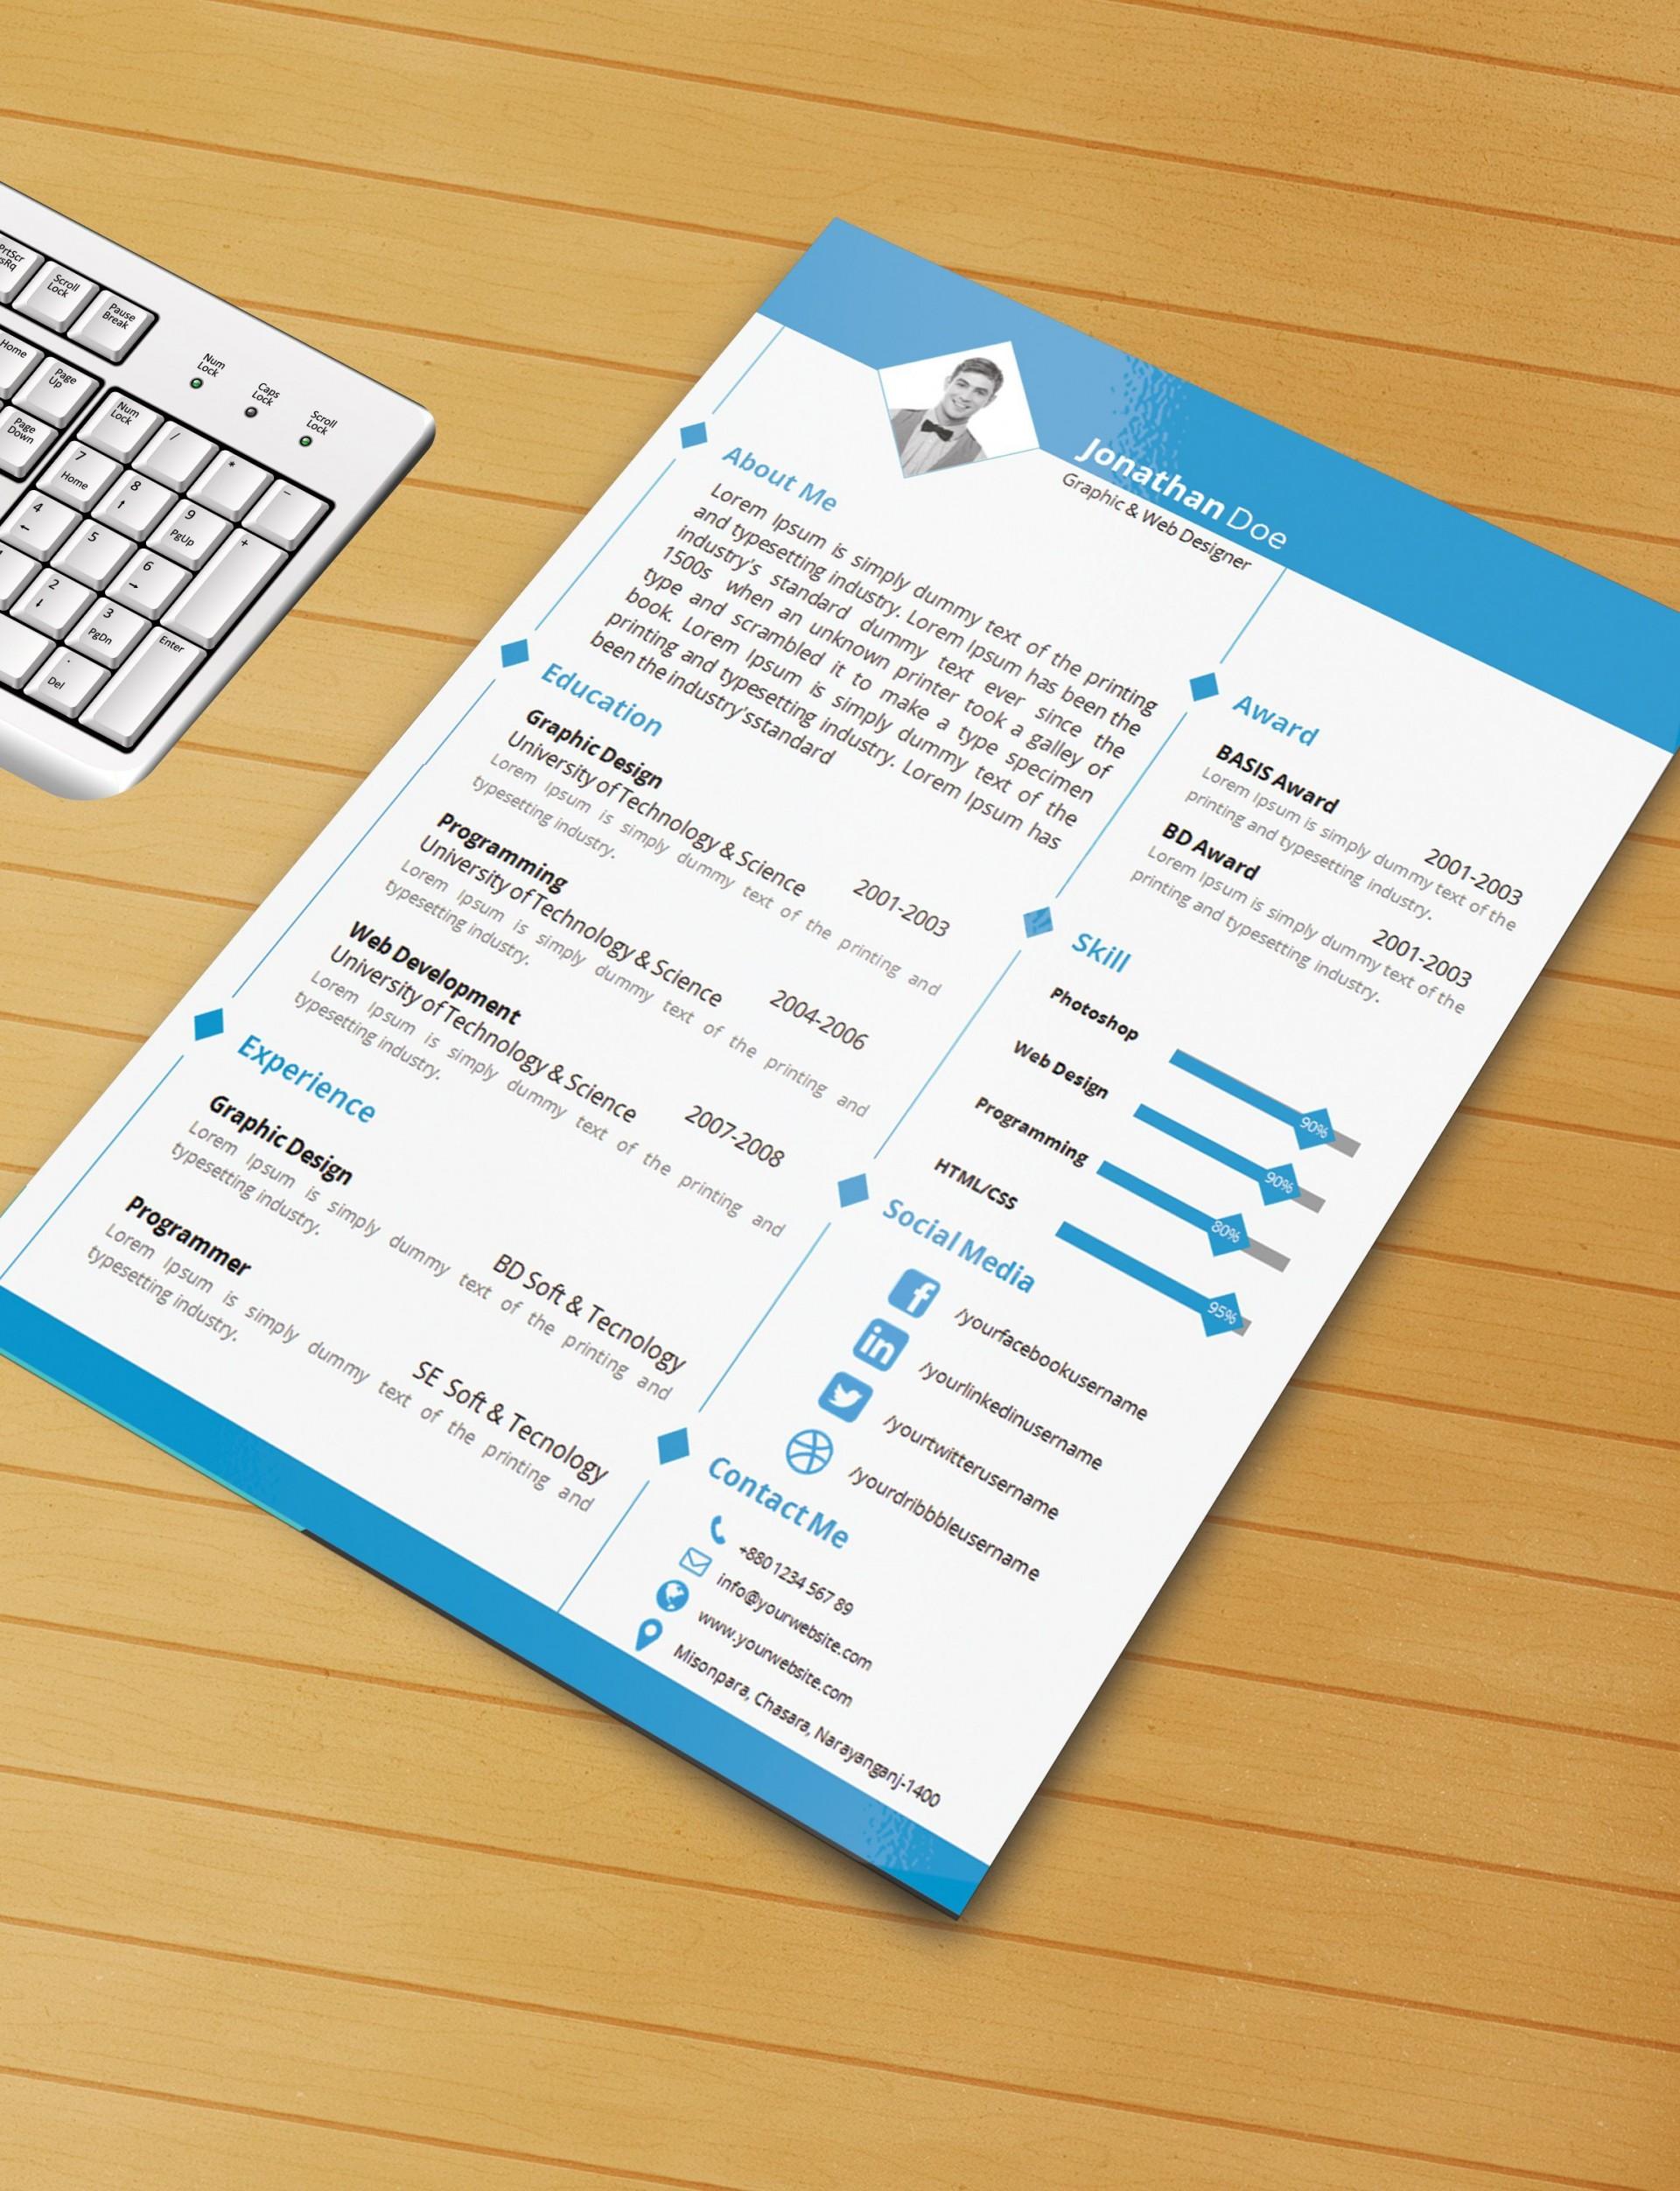 003 Imposing Microsoft Word Template Download Image  M Cv Free Header1920